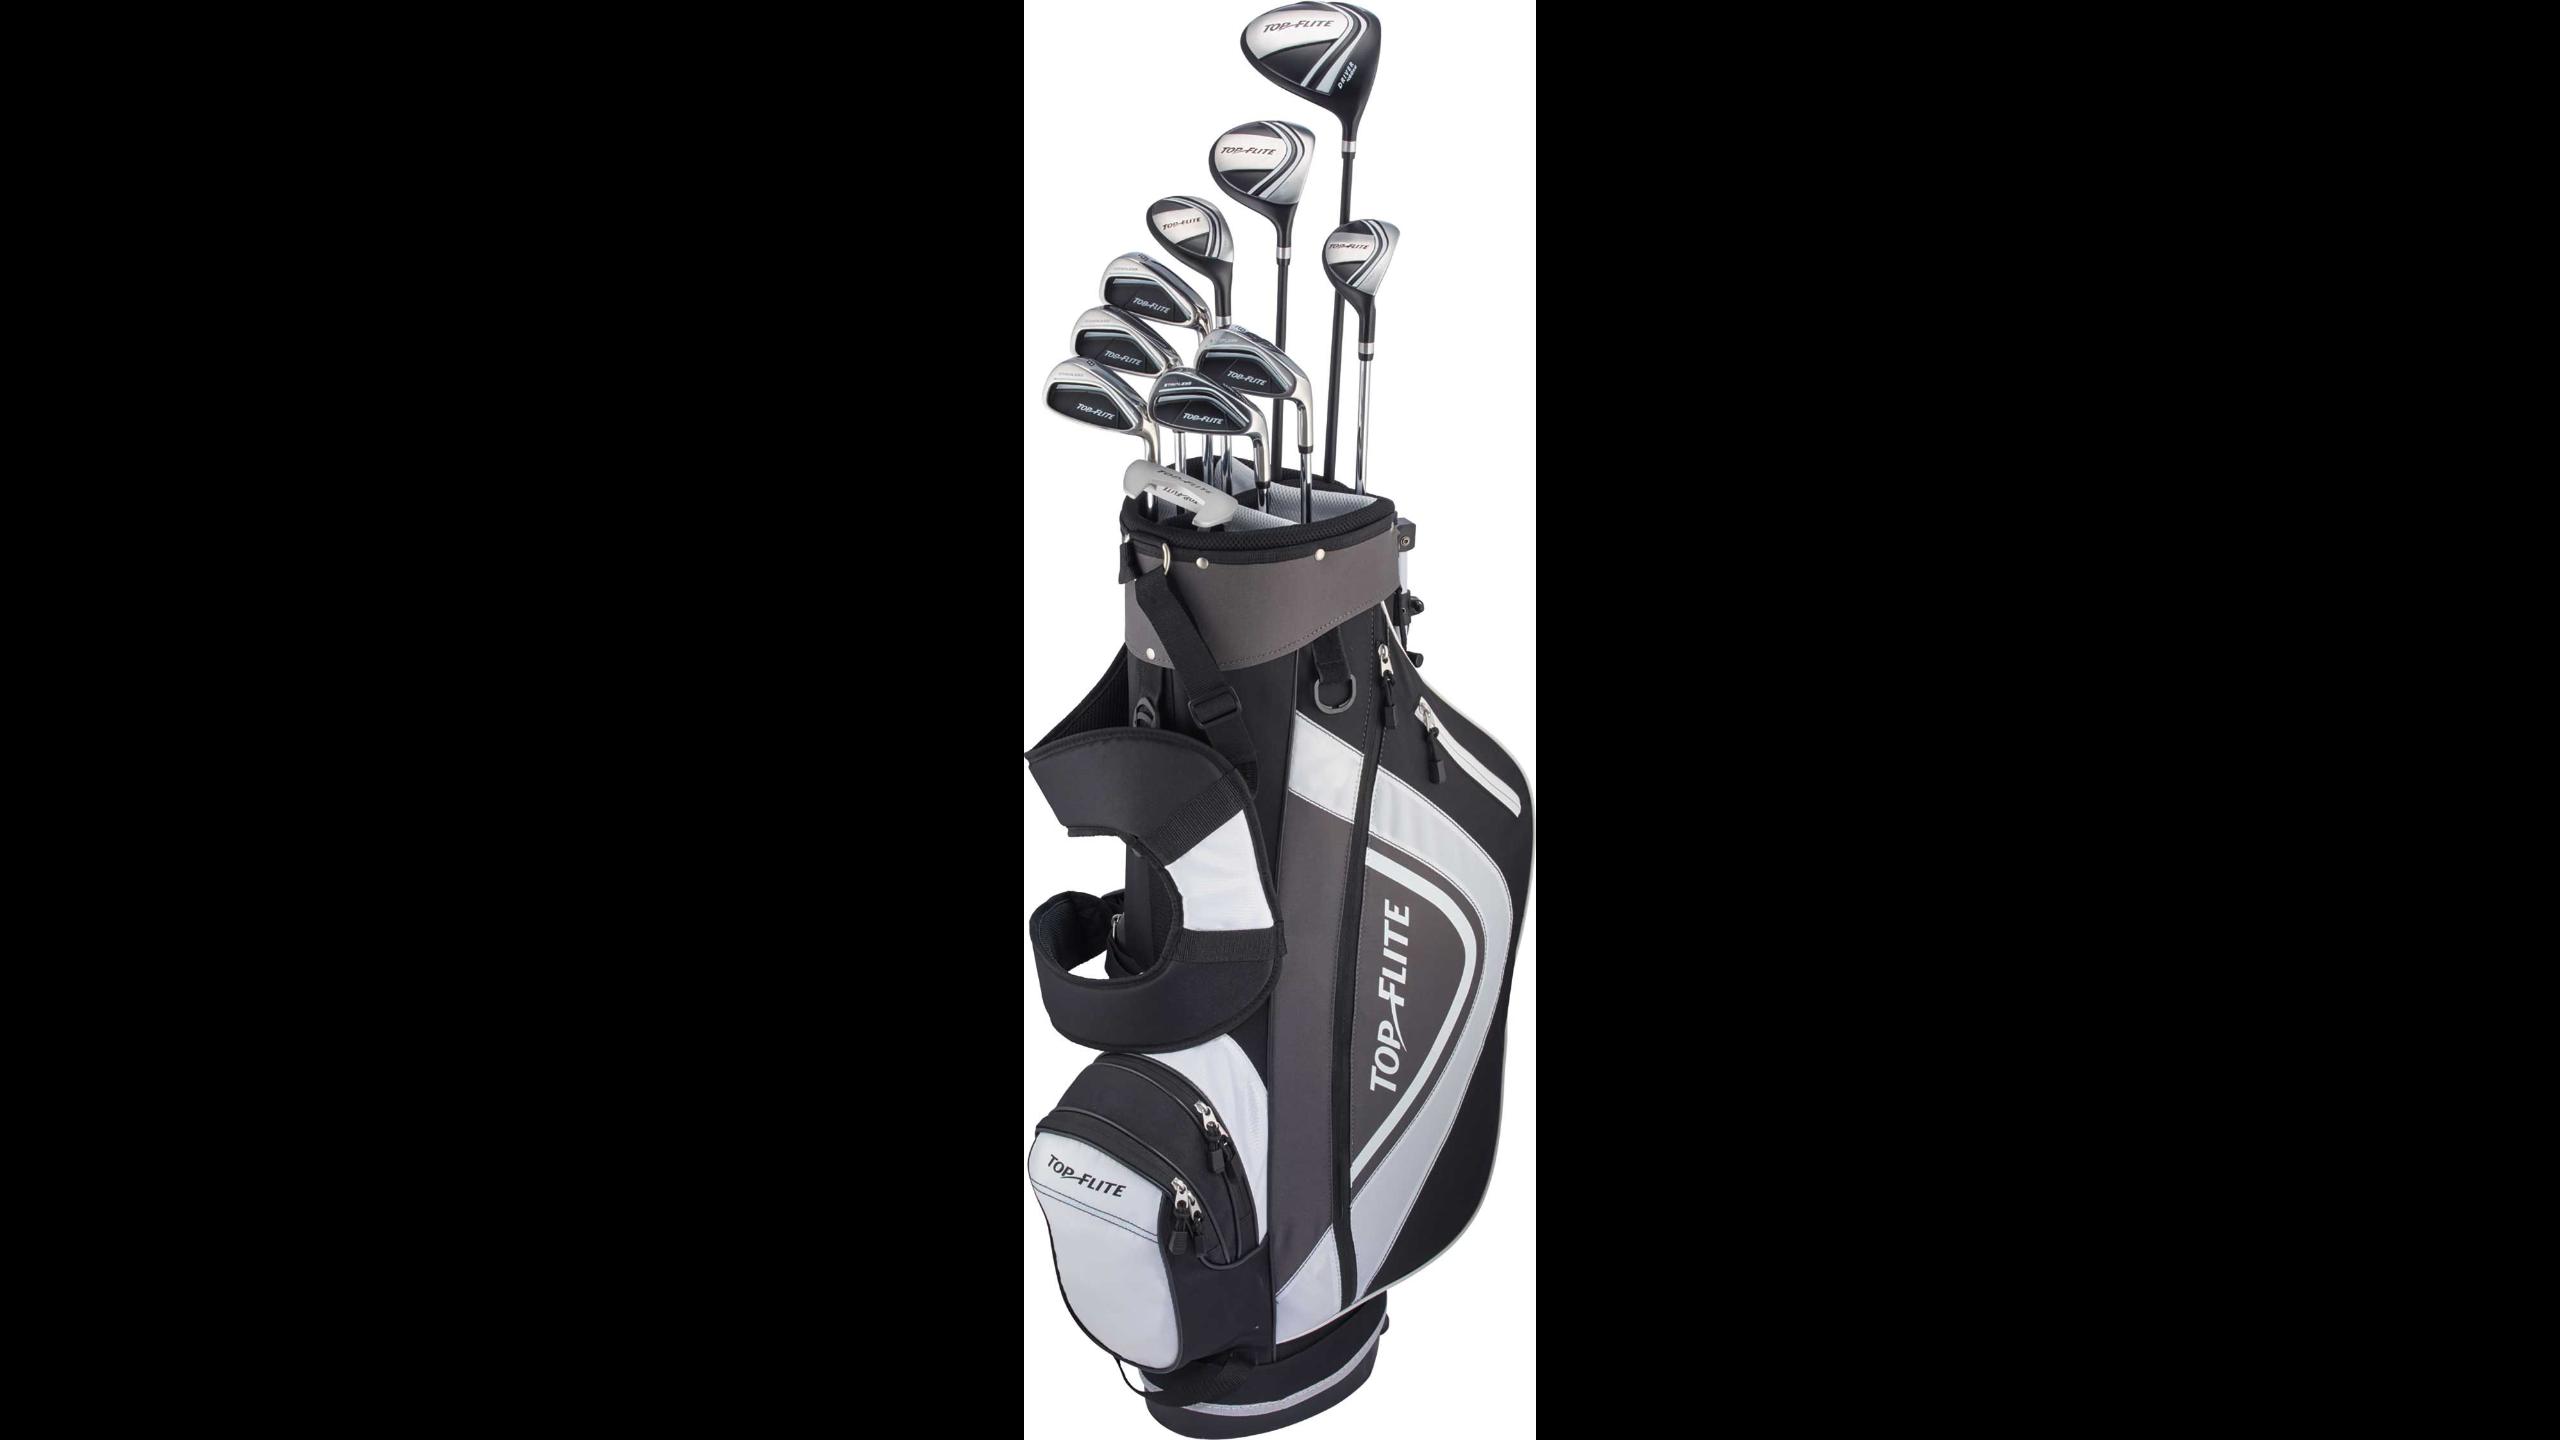 Golf Galaxy: Flash Sale- BOGO Select Golf Balls, Top Flite XL Complete Sets $150 & More